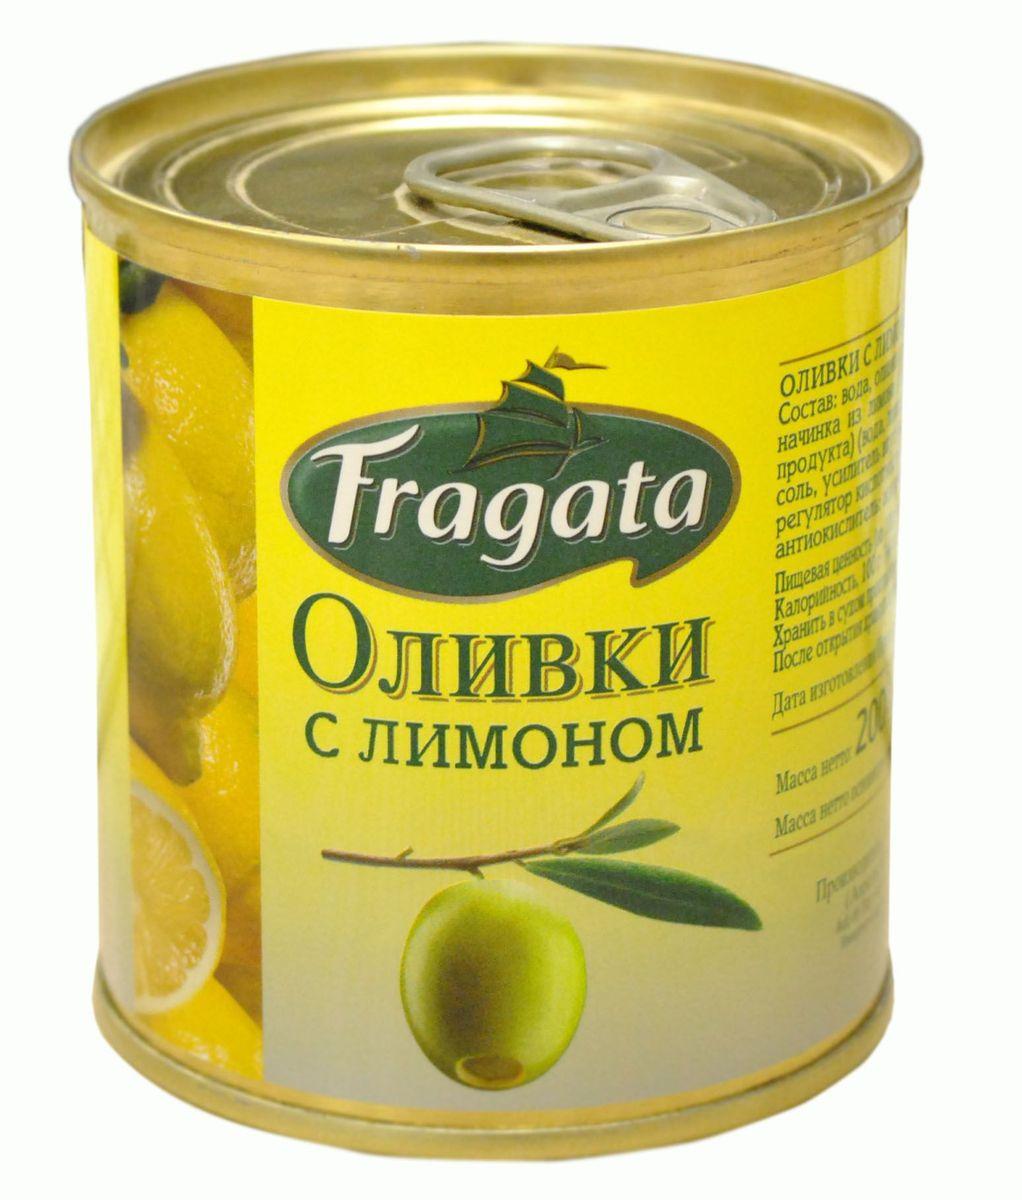 Fragata оливки с лимоном, 200 г iberica оливки с лимоном 300 г